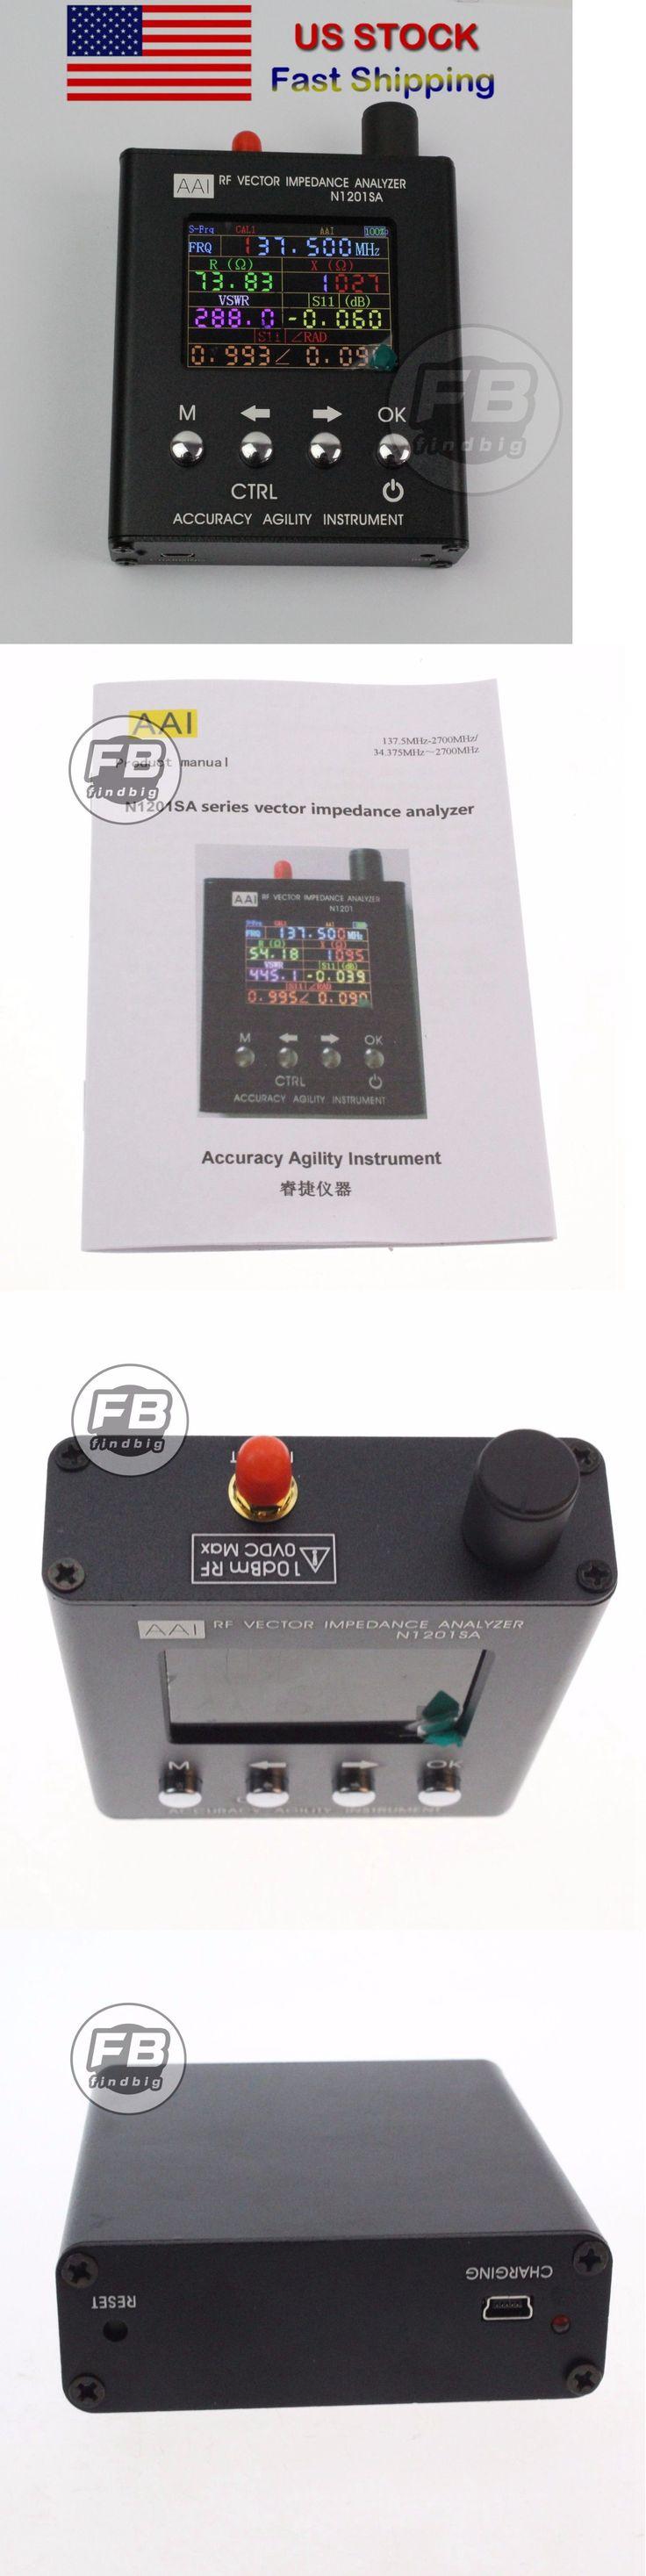 Other Ham Radio Equipment: N1201sa 140Mhz 2.7Ghz Uv Rf Vector Impedance Ant Swr Antenna Analyzer Meter -> BUY IT NOW ONLY: $175.99 on eBay!